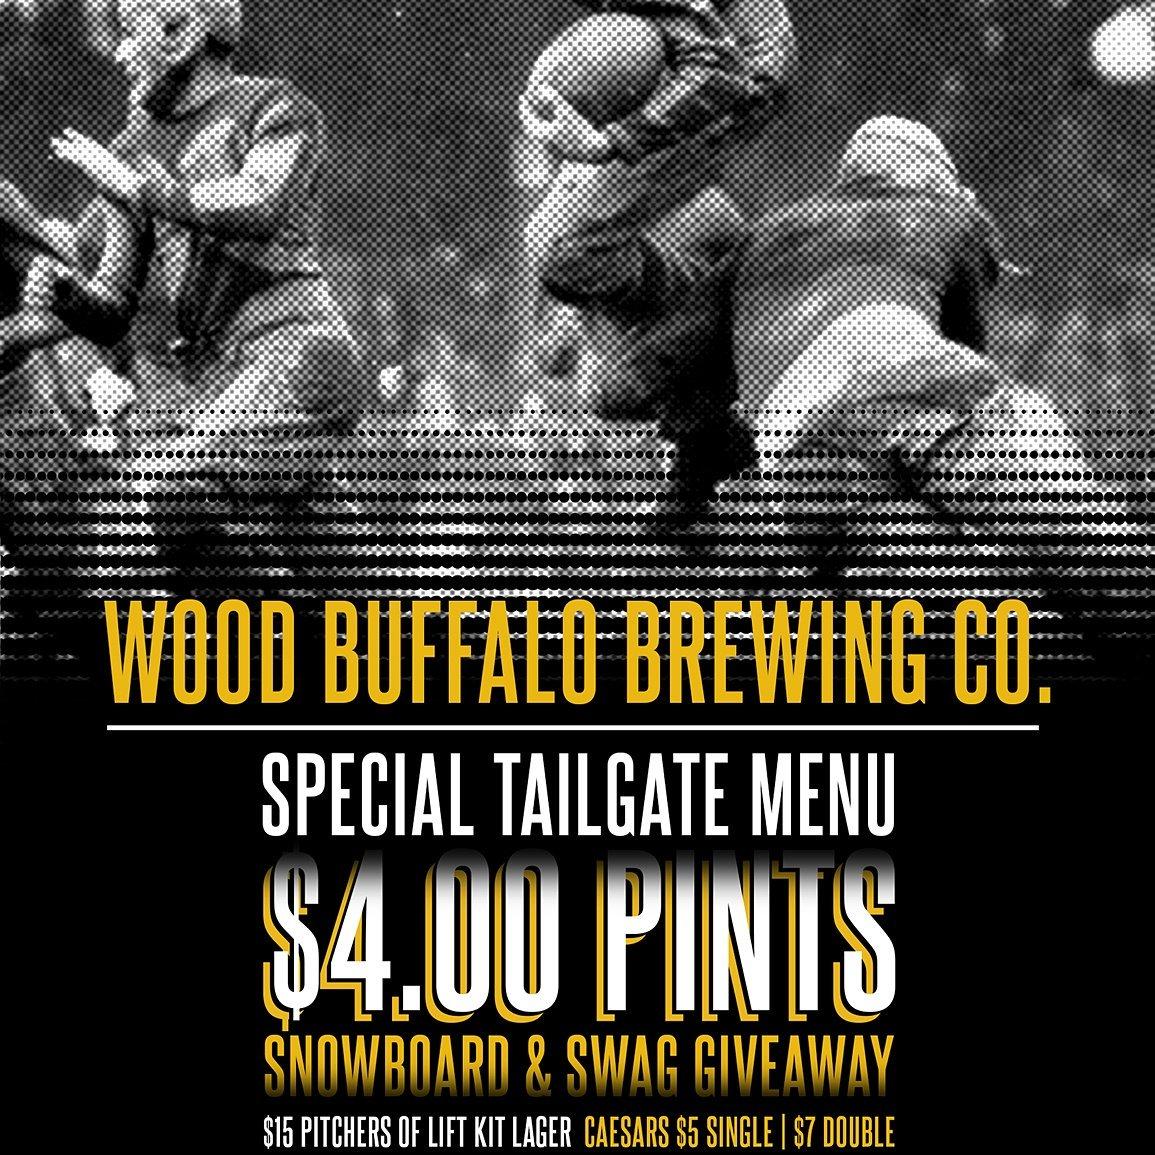 Buffalo brewing company advertisement giveaways